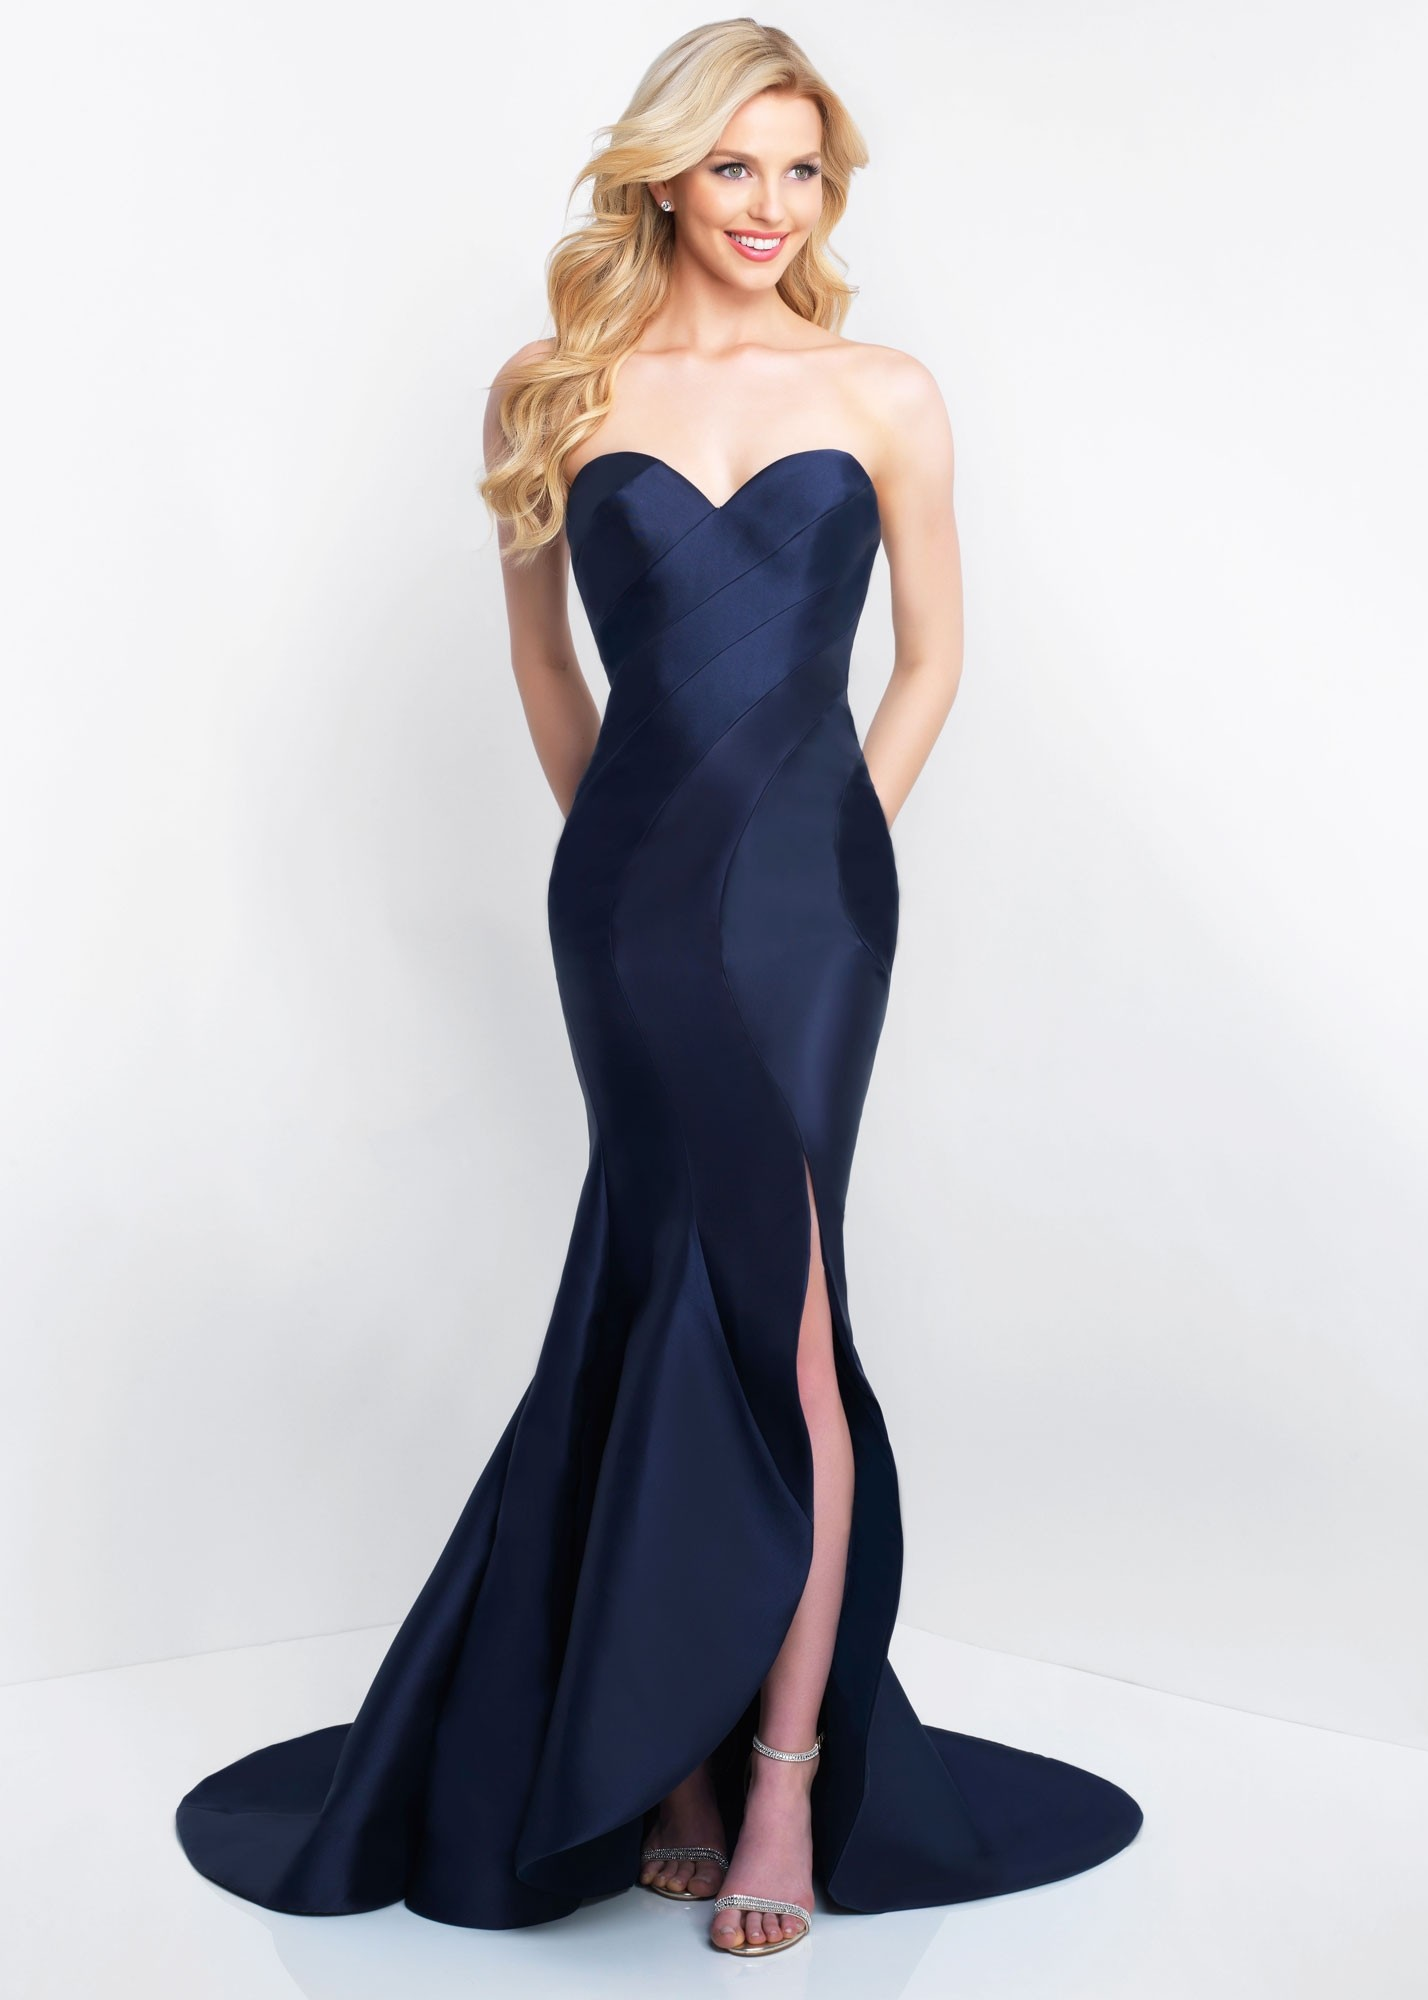 7971bd709f5 Blush Prom C1063 Strapless Asymmetrical Evening Gown | RissyRoos.com